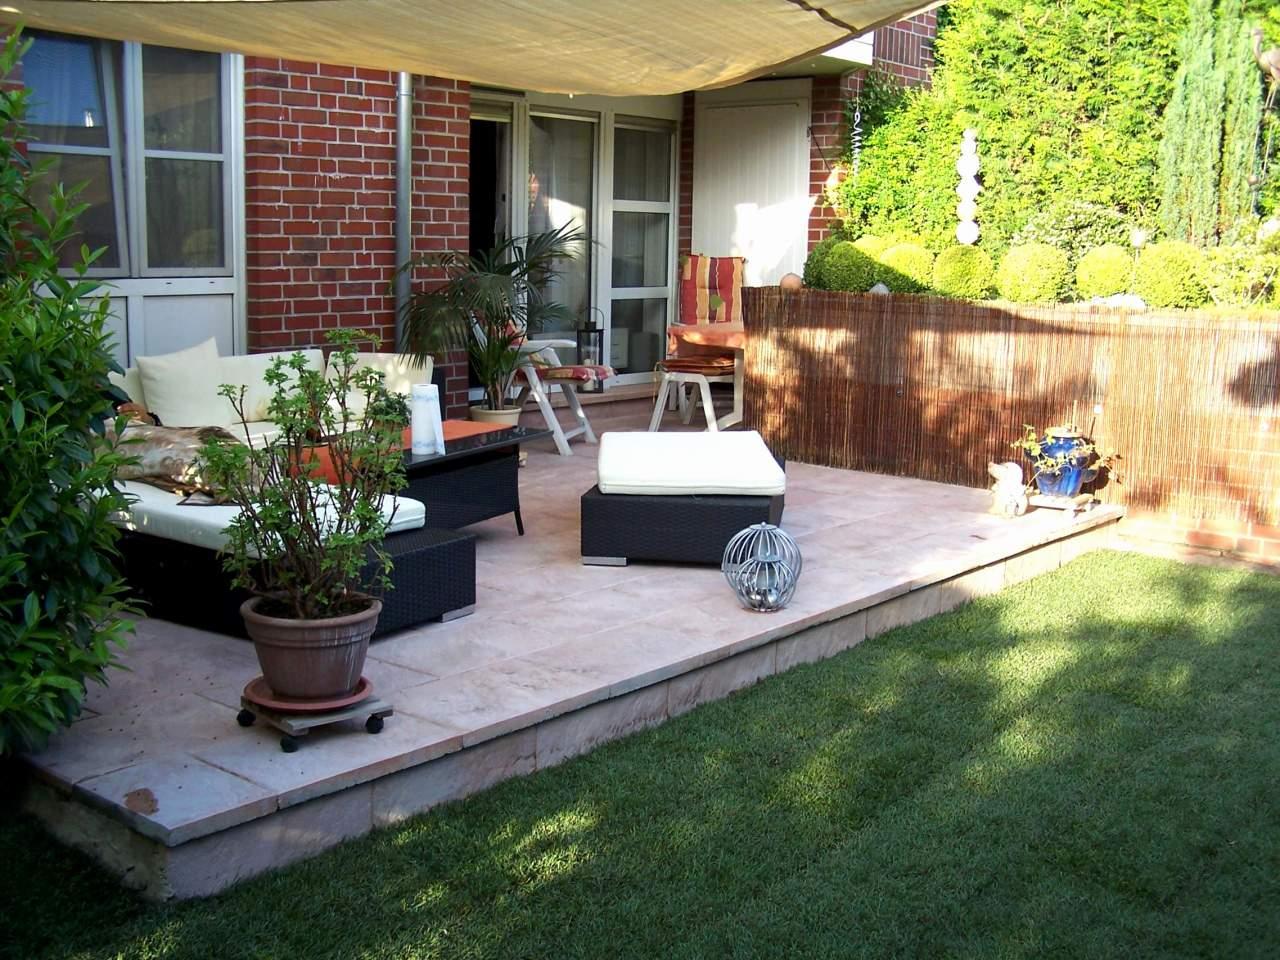 backyard porch terrasse balkon schon sitzbank mit stauraum garten neu sessel durch backyard porch